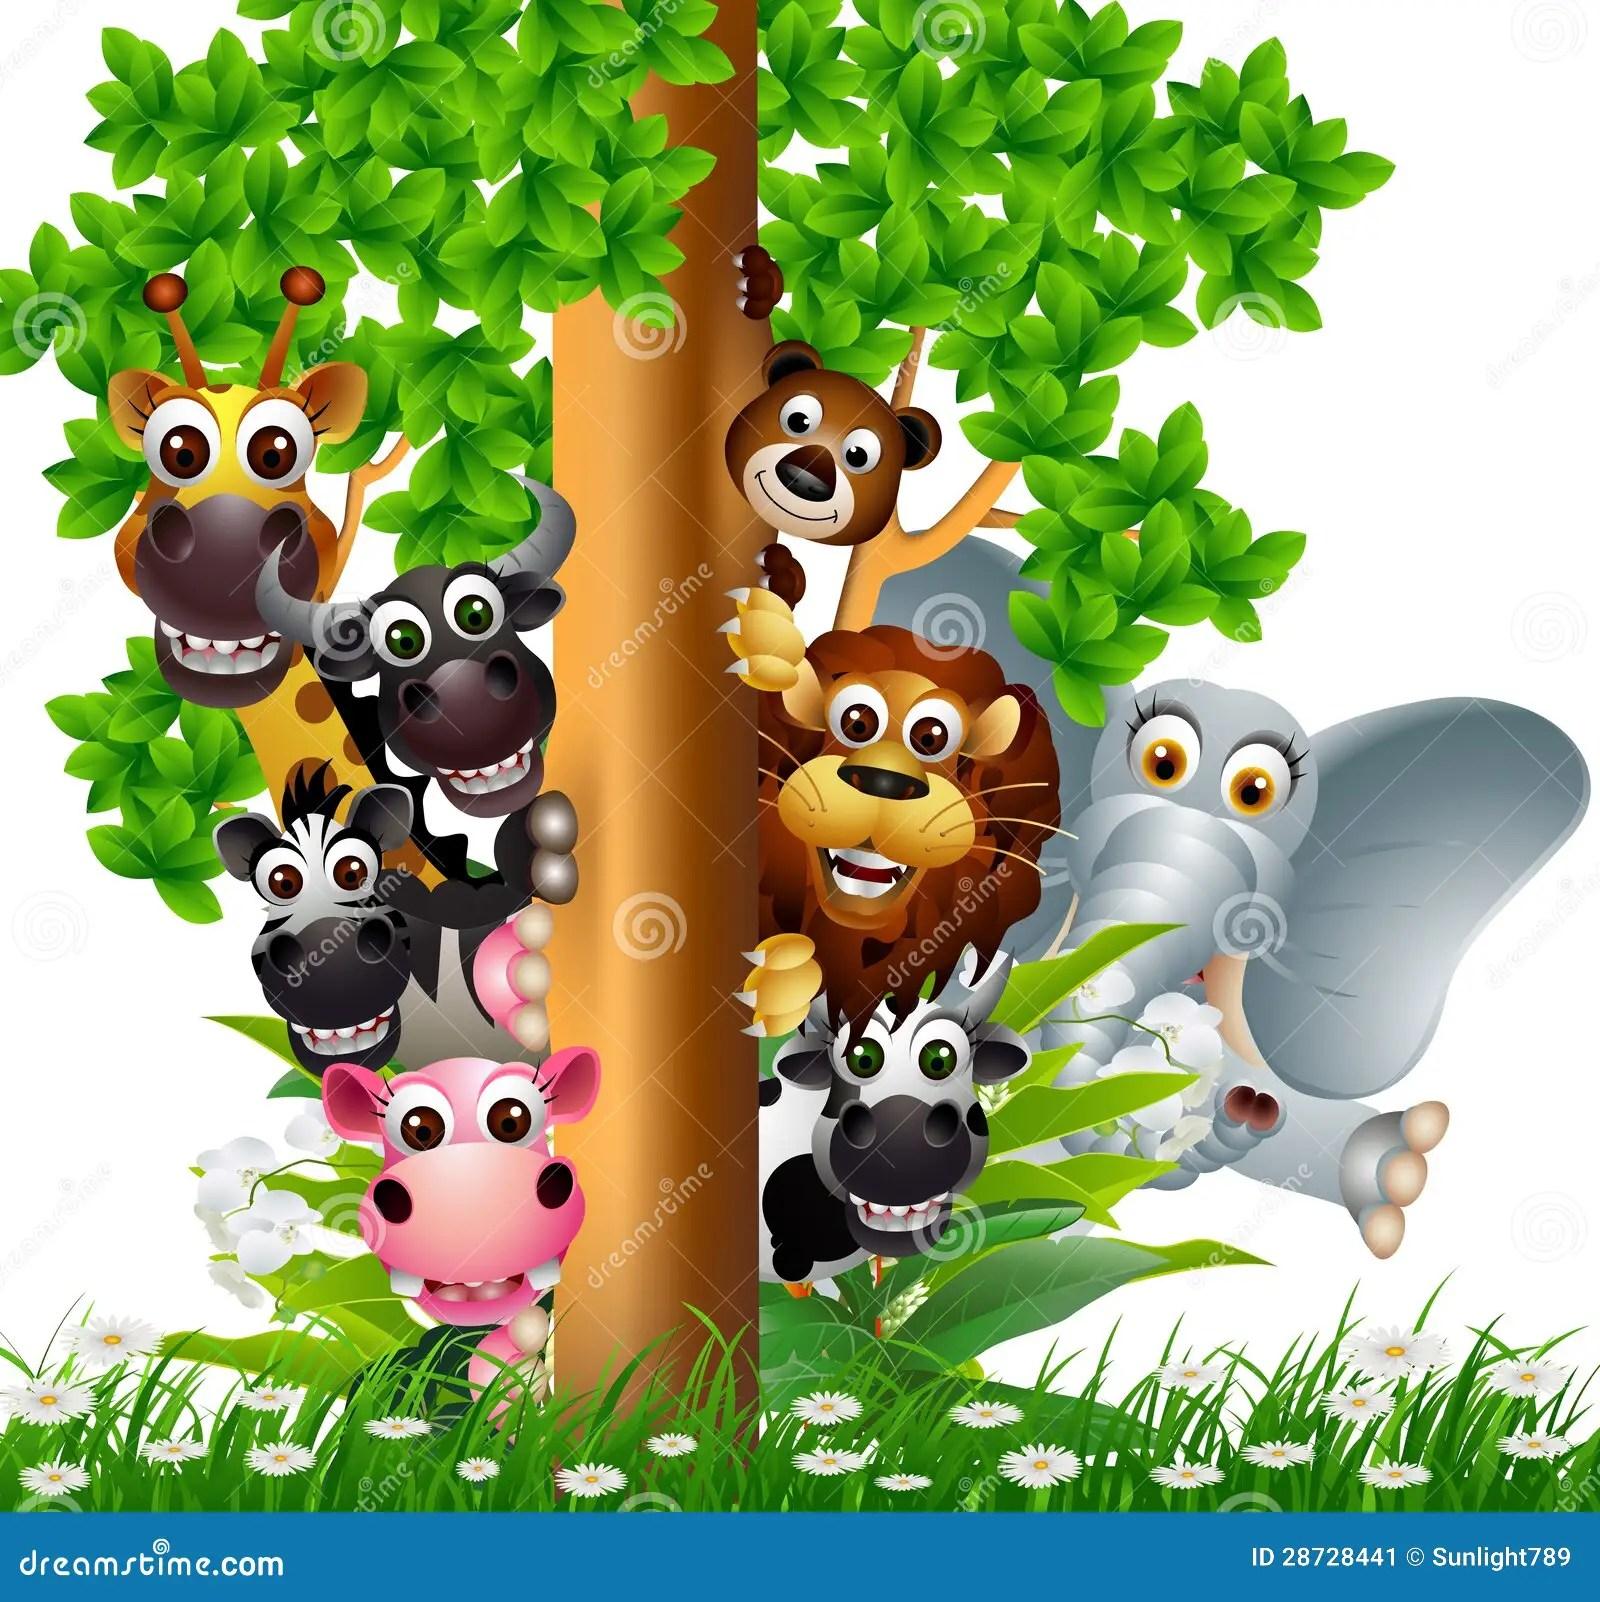 Cute Cartoon Elephant Wallpaper Funny Animal Wildlife Cartoon Collection Stock